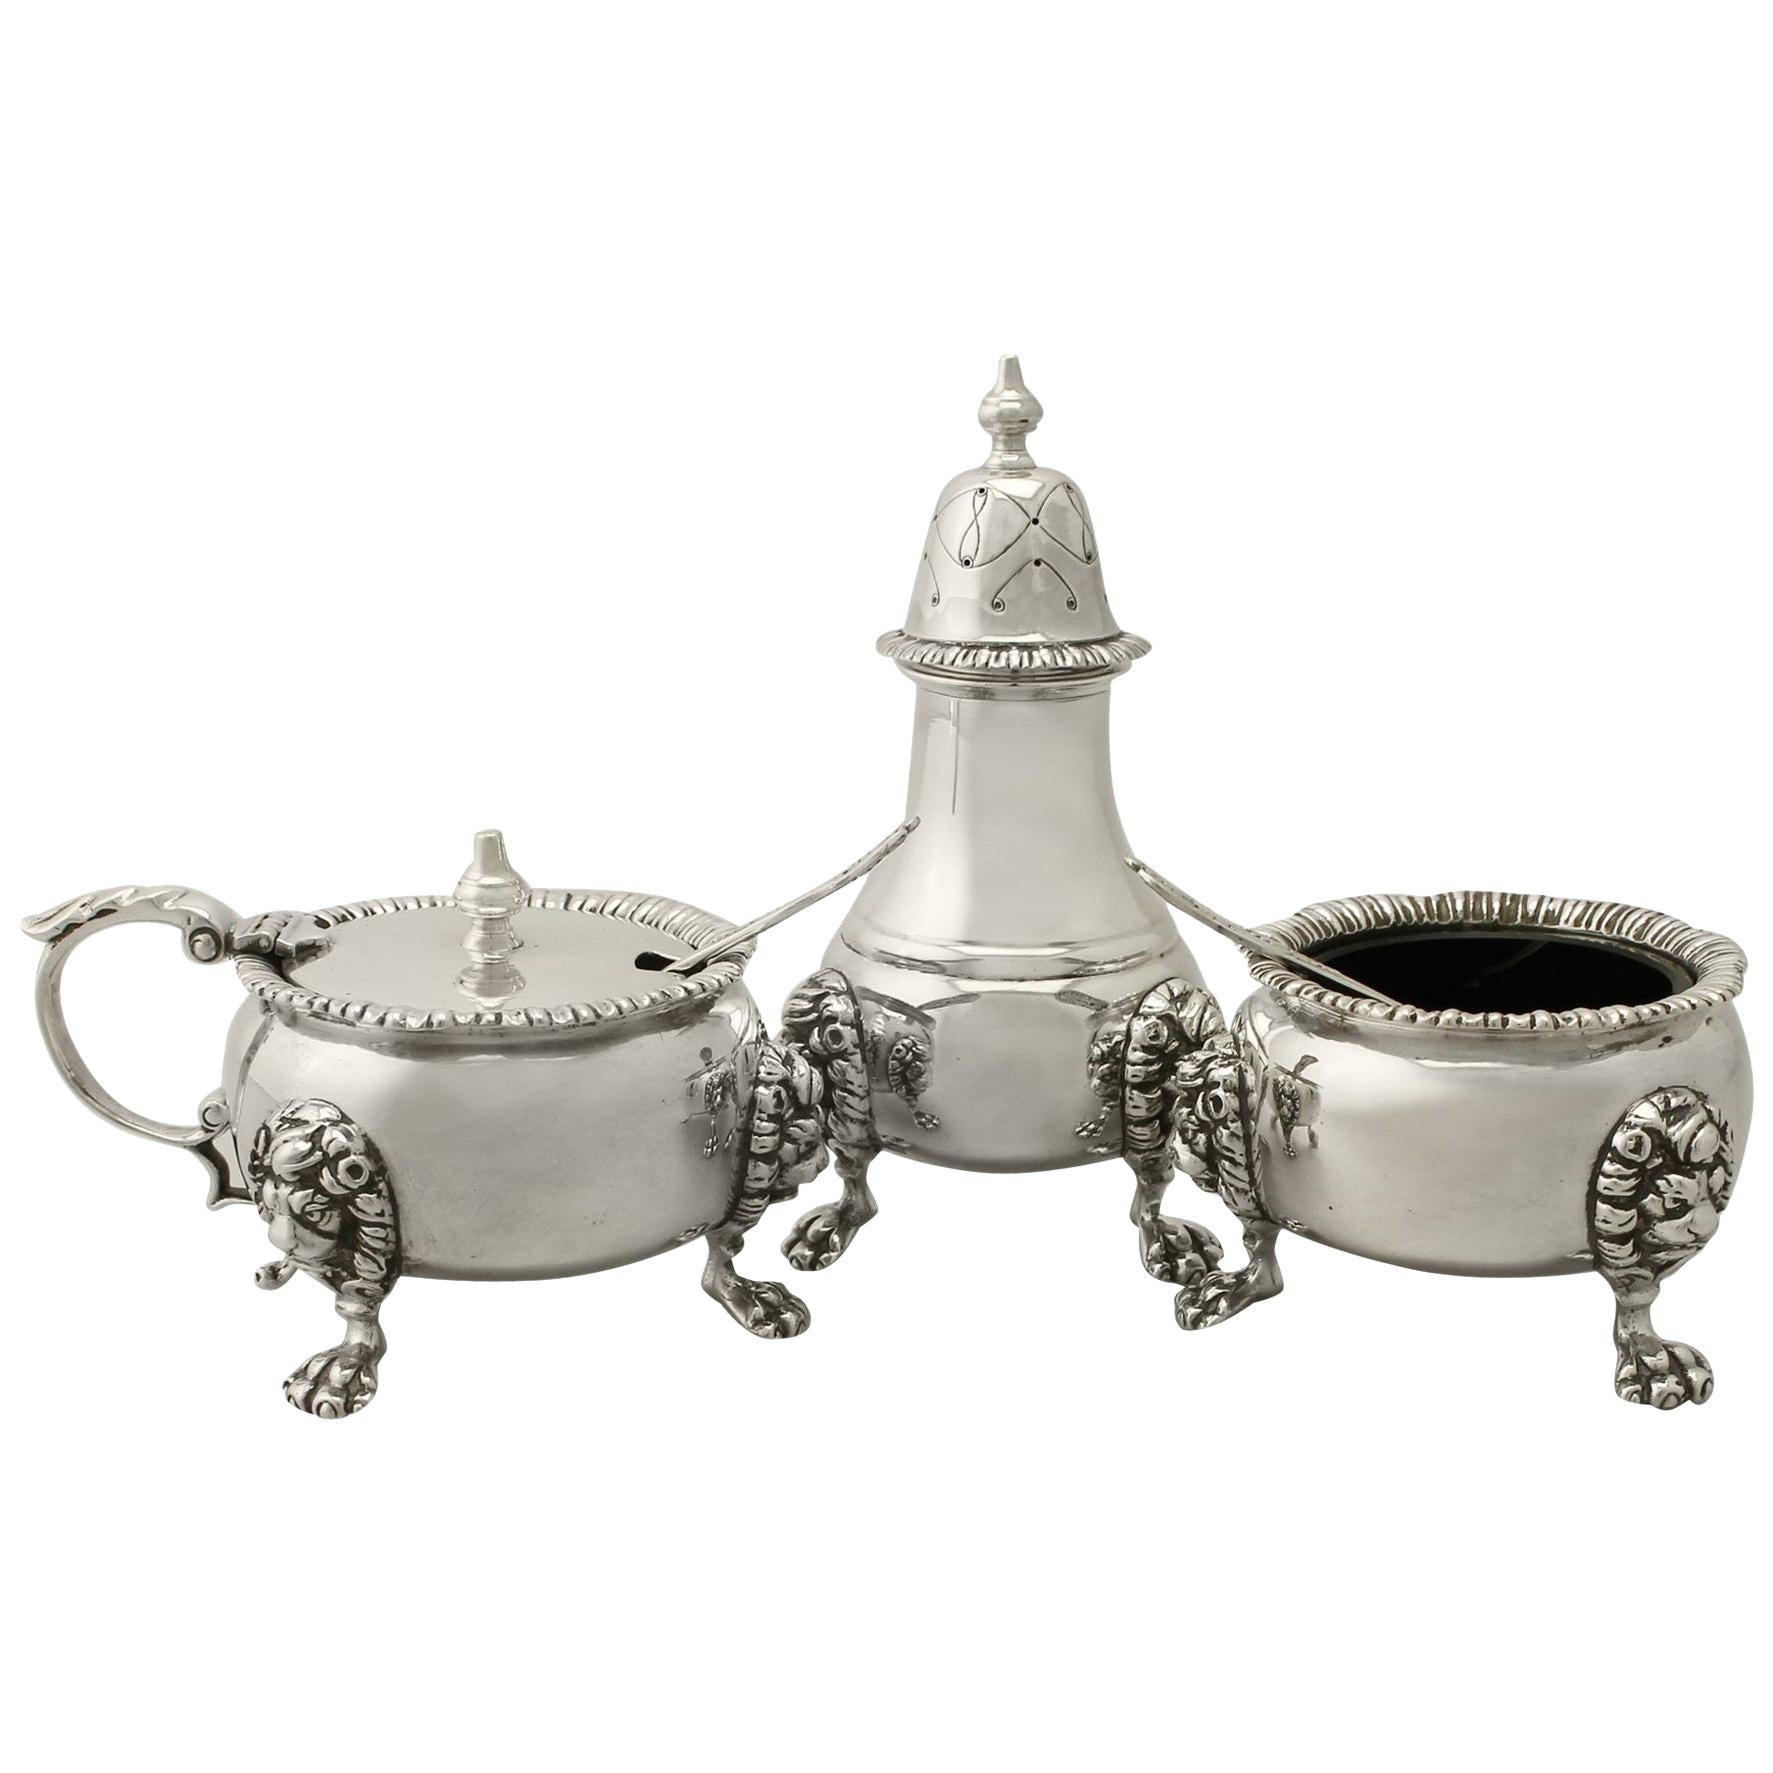 Vintage Sterling Silver Condiment Set, 1967